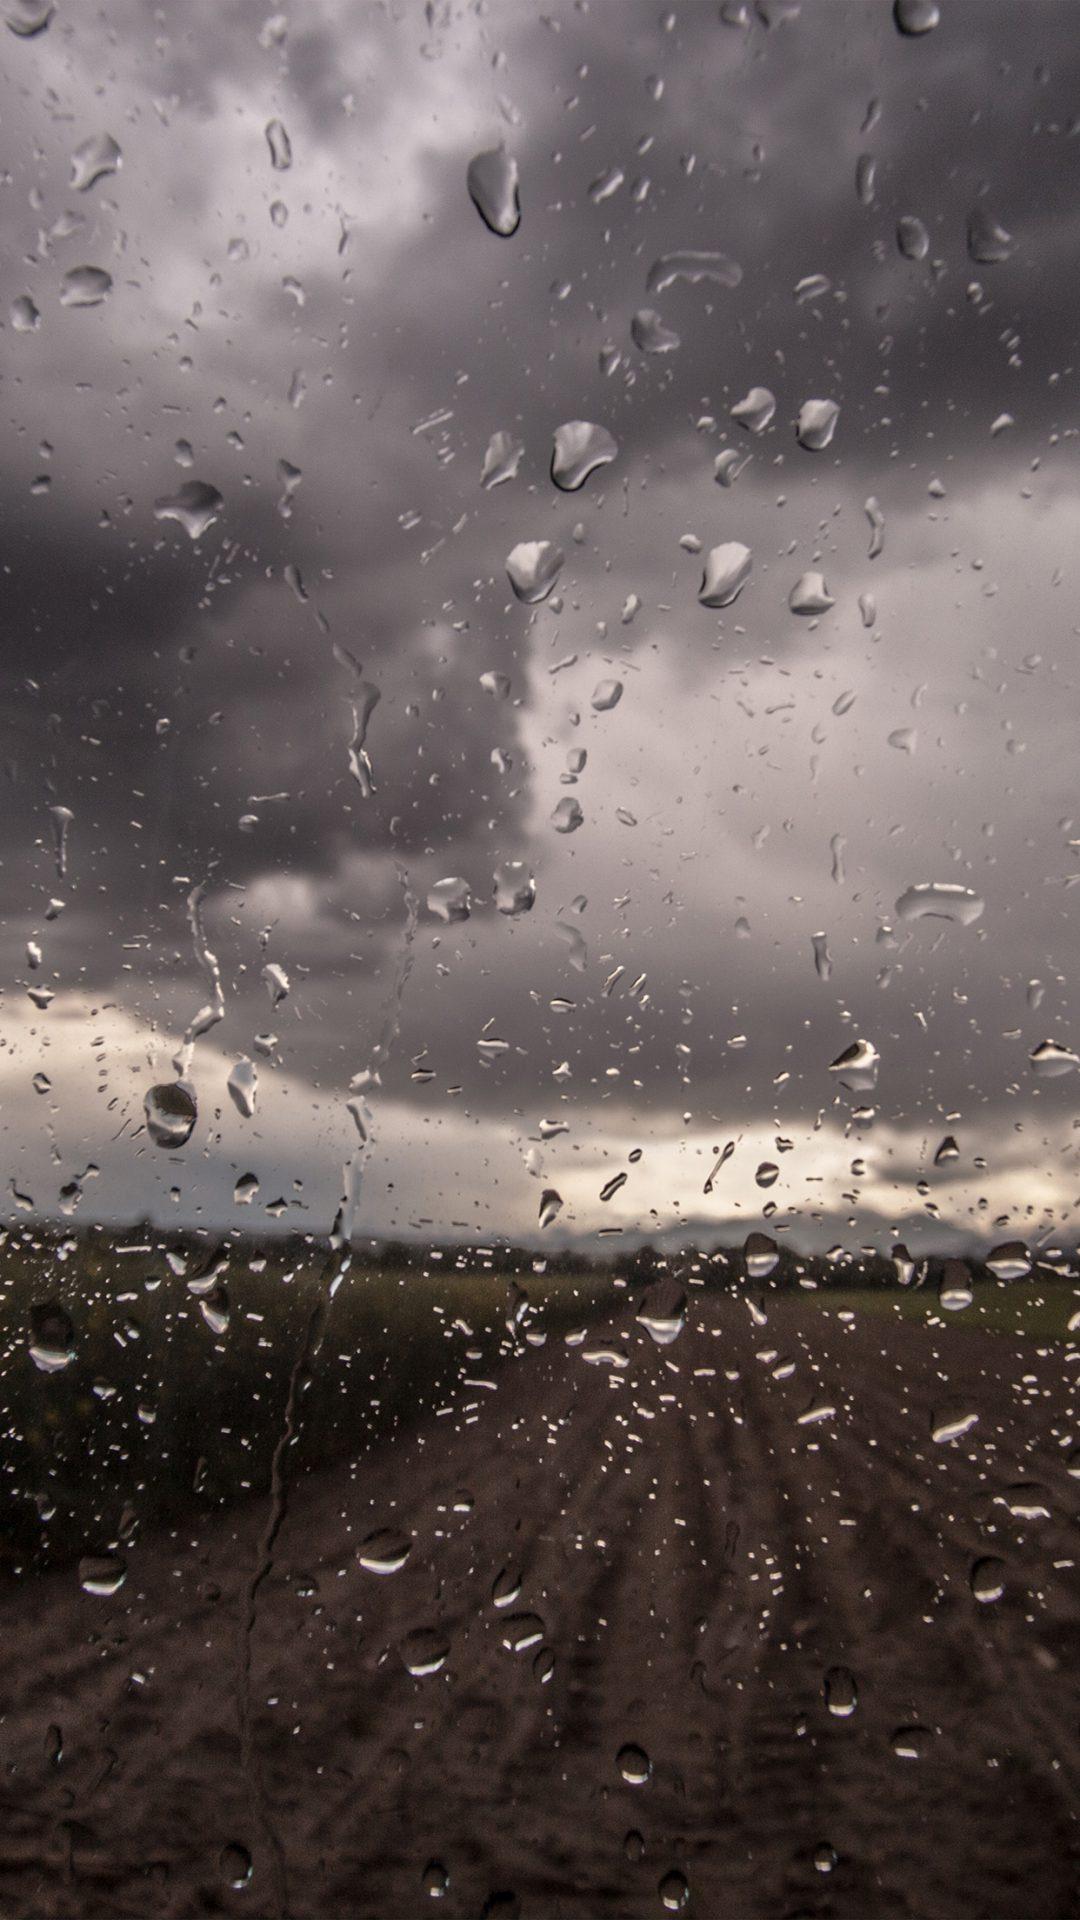 Rainy Window Nature Water Drop Road